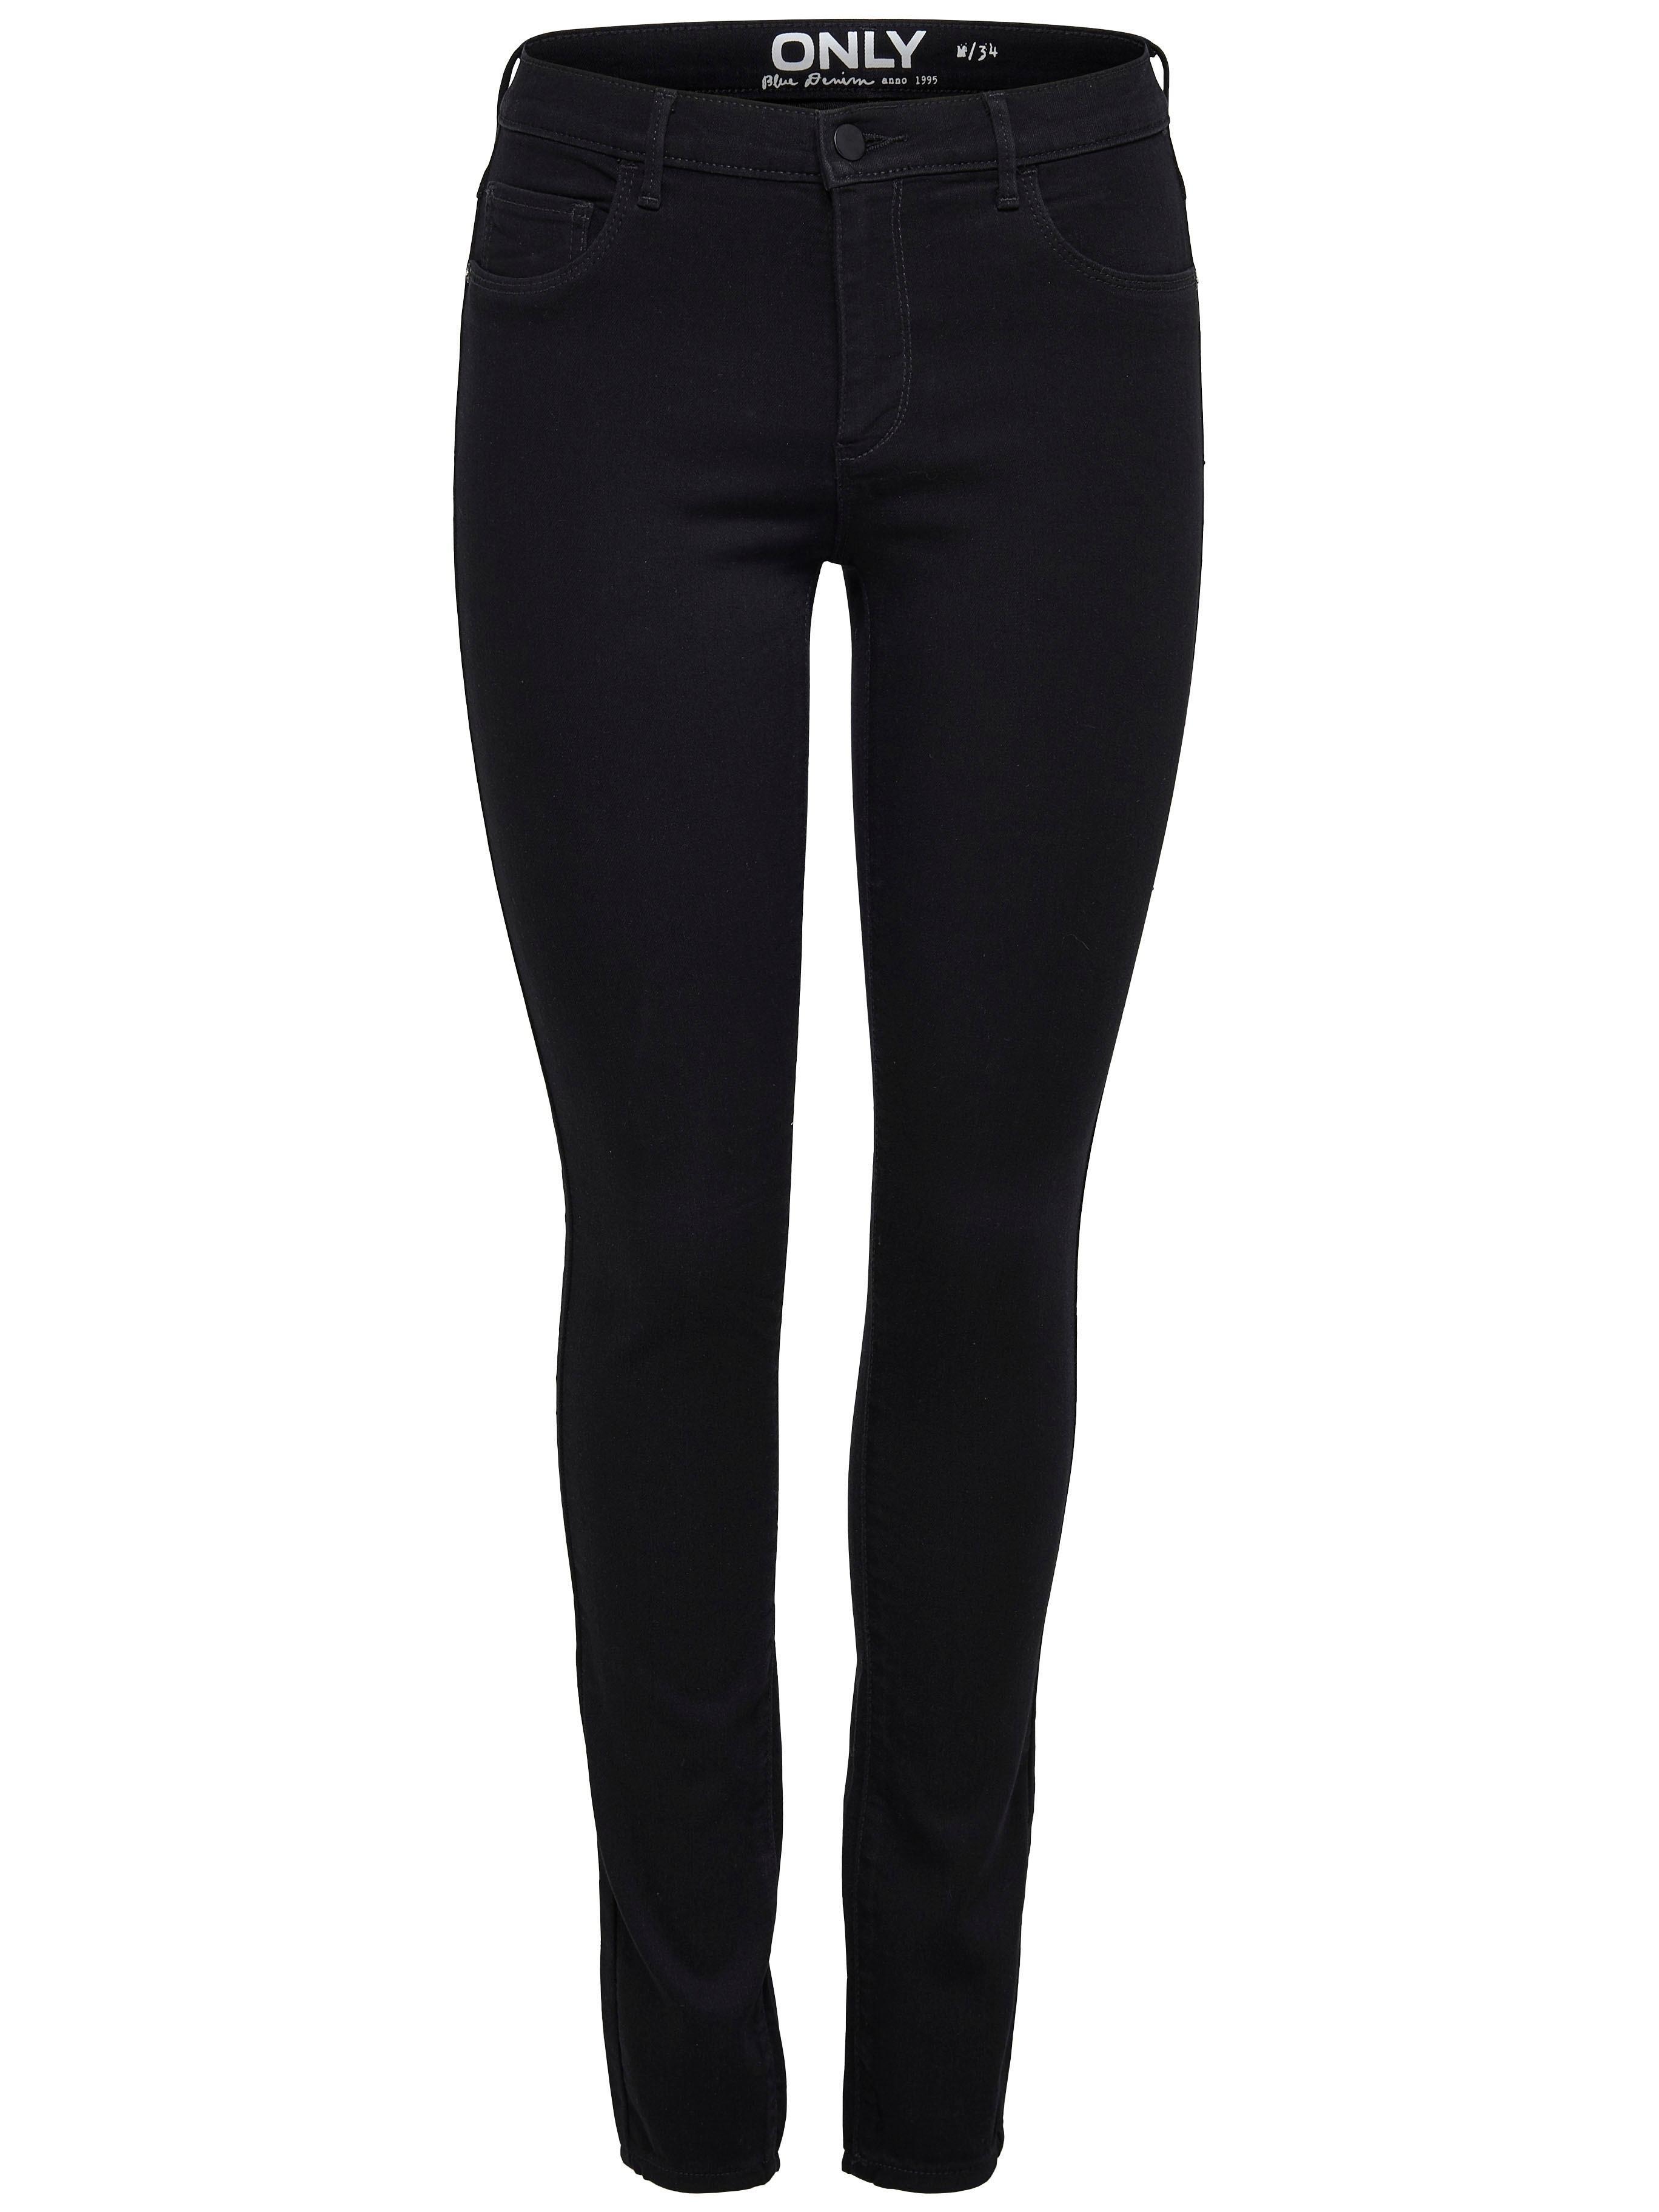 ONLY skinny jeans »RAIN« - gratis ruilen op otto.nl